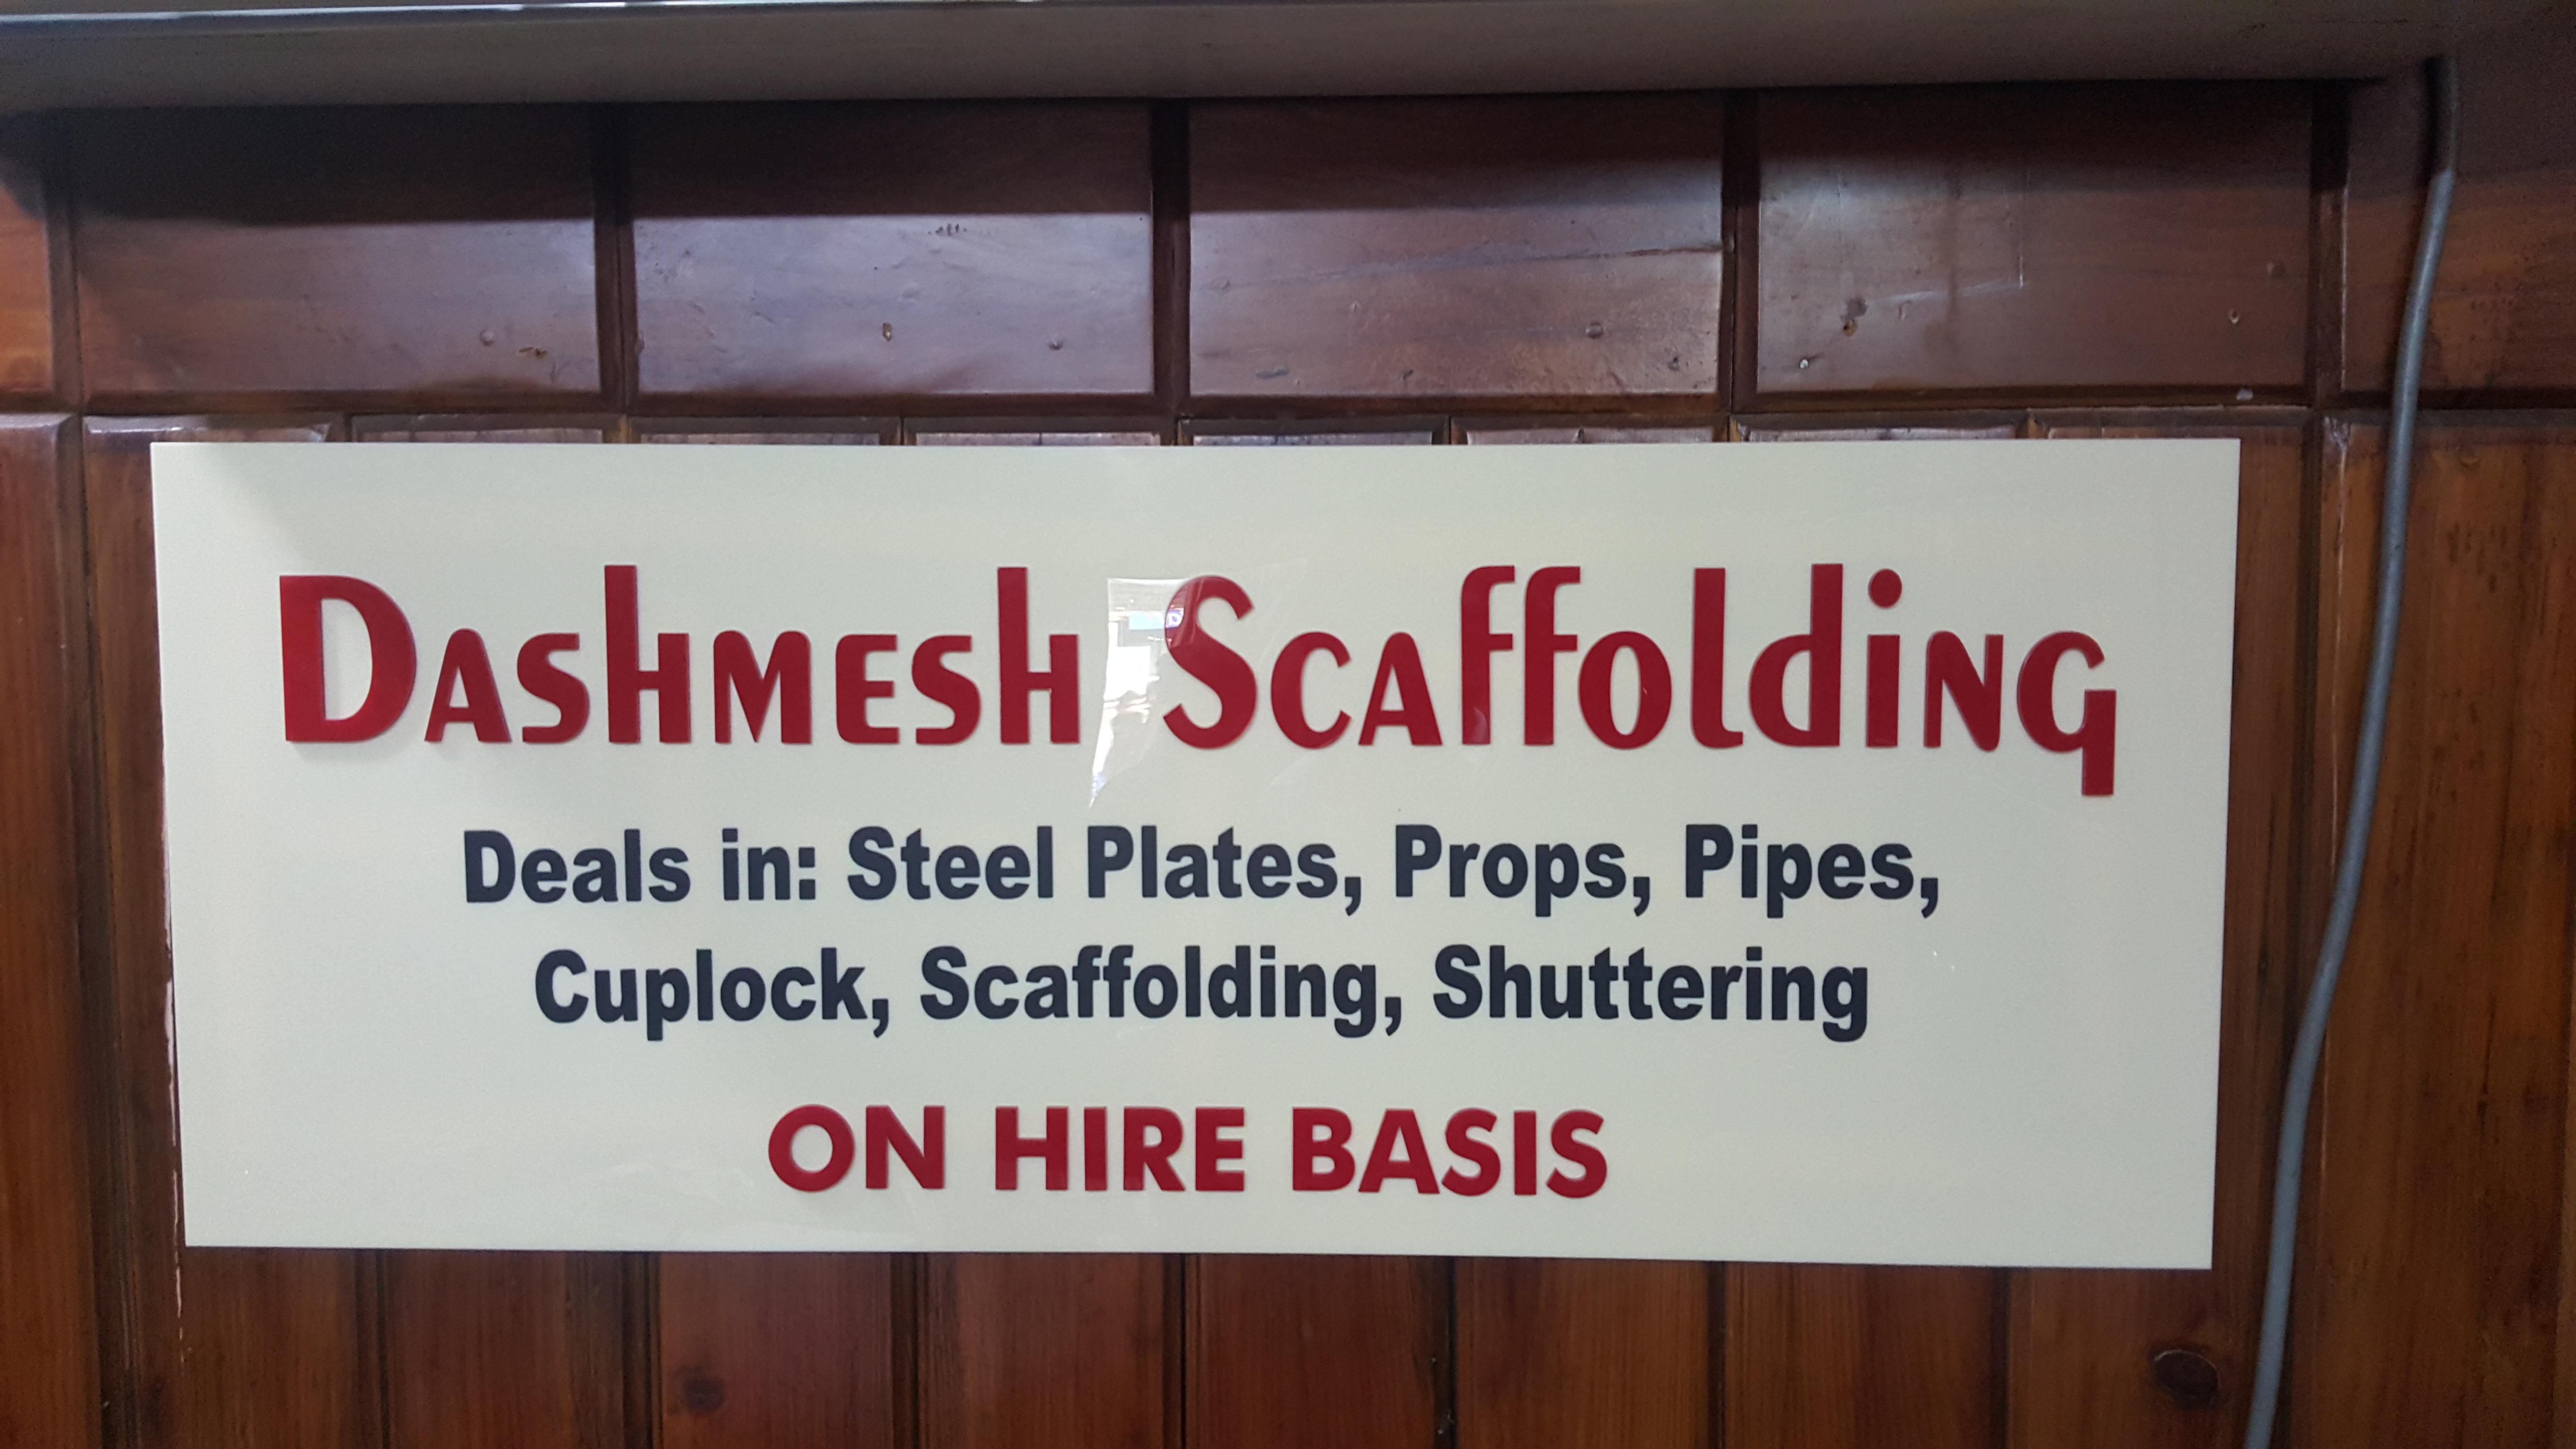 Dashmesh Scaffolding